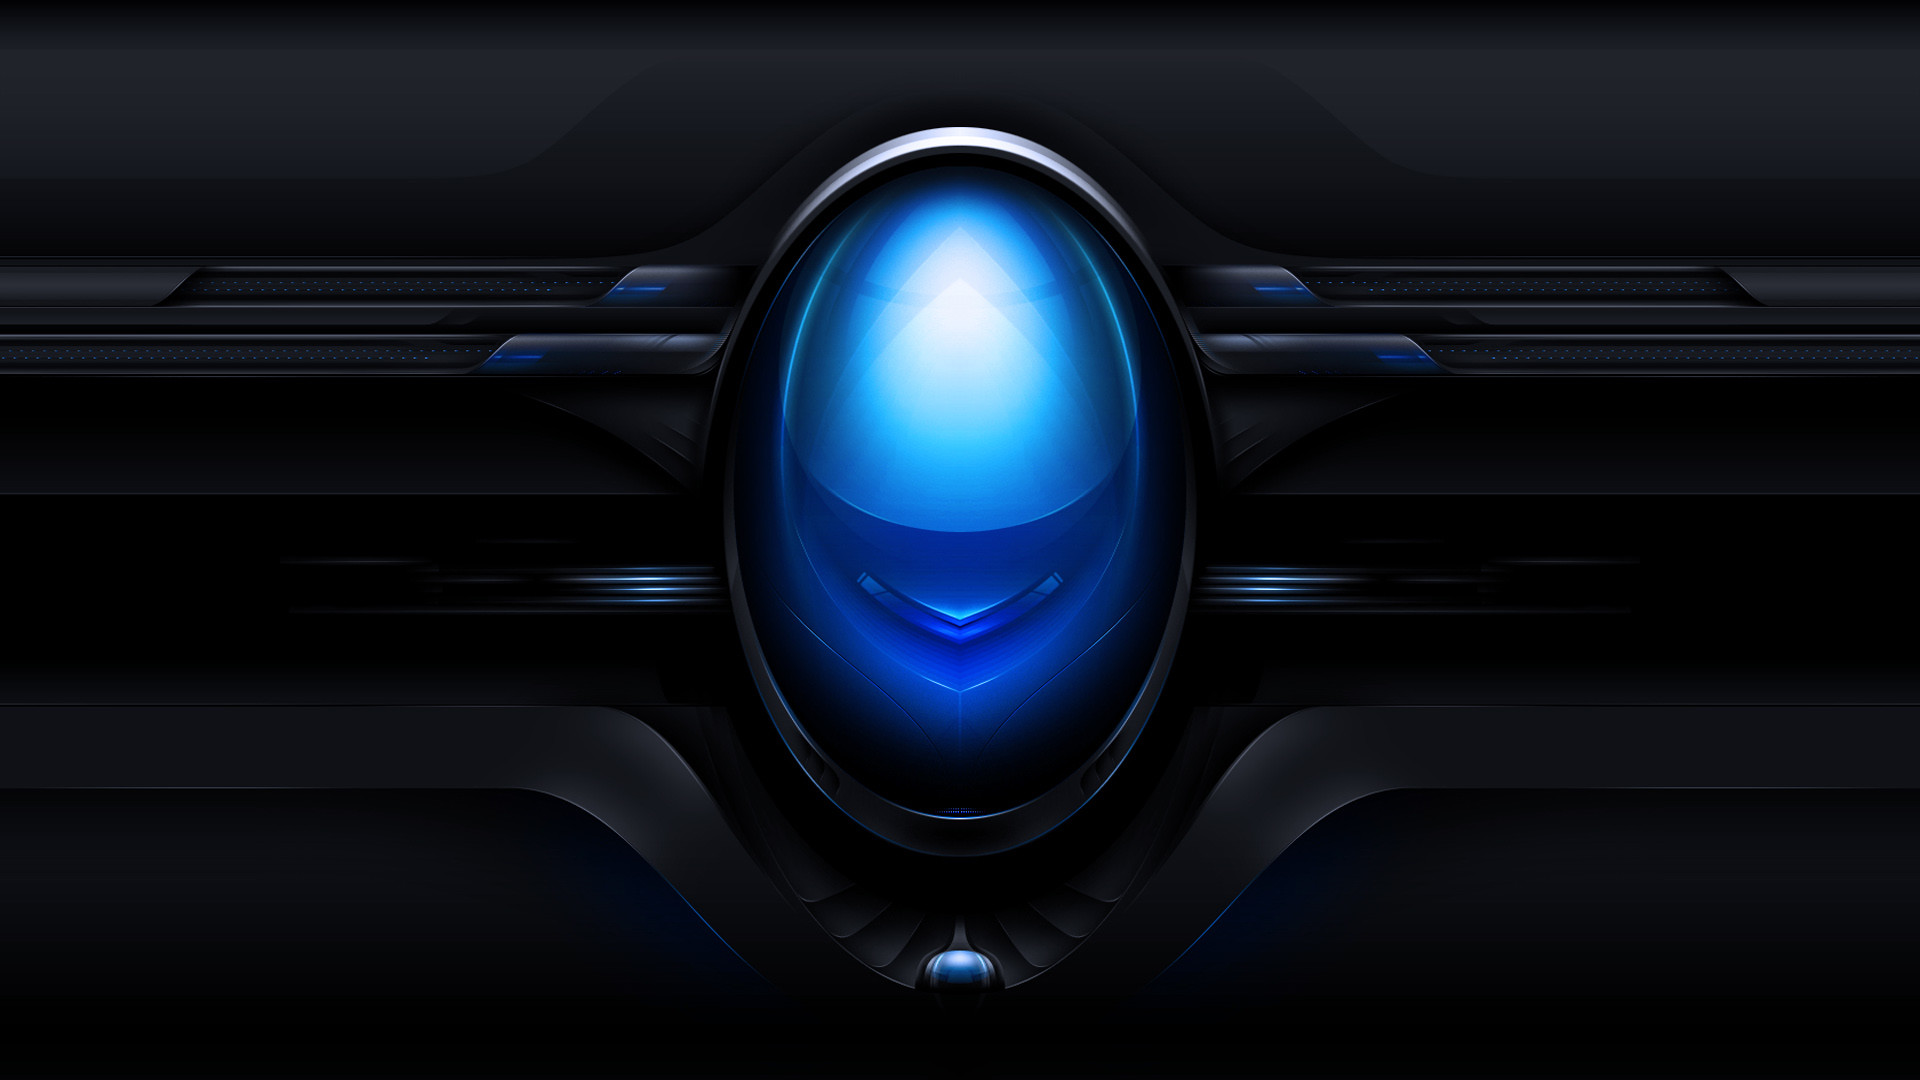 Black And Blue Alienware Wallpaper 37 Desktop Wallpaper. Black And Blue Alienware  Wallpaper 37 Desktop Wallpaper. …